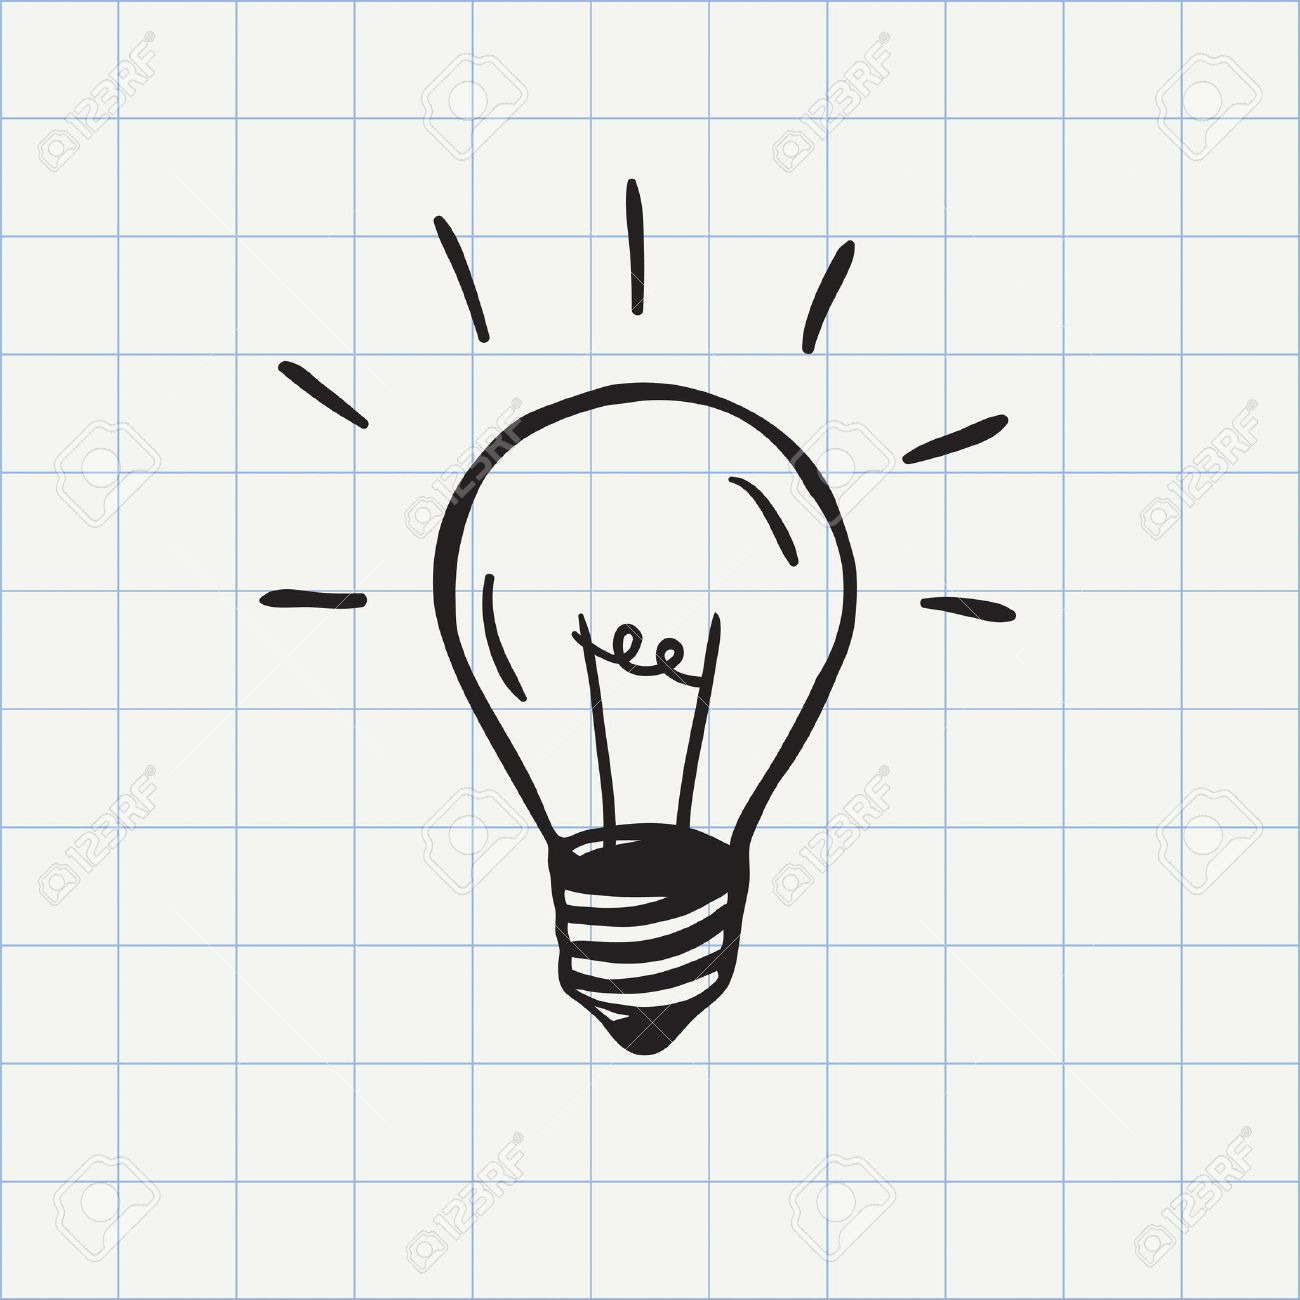 Light bulb icon idea symbol sketch in vector. Hand-drawn doodle sign - 49607034